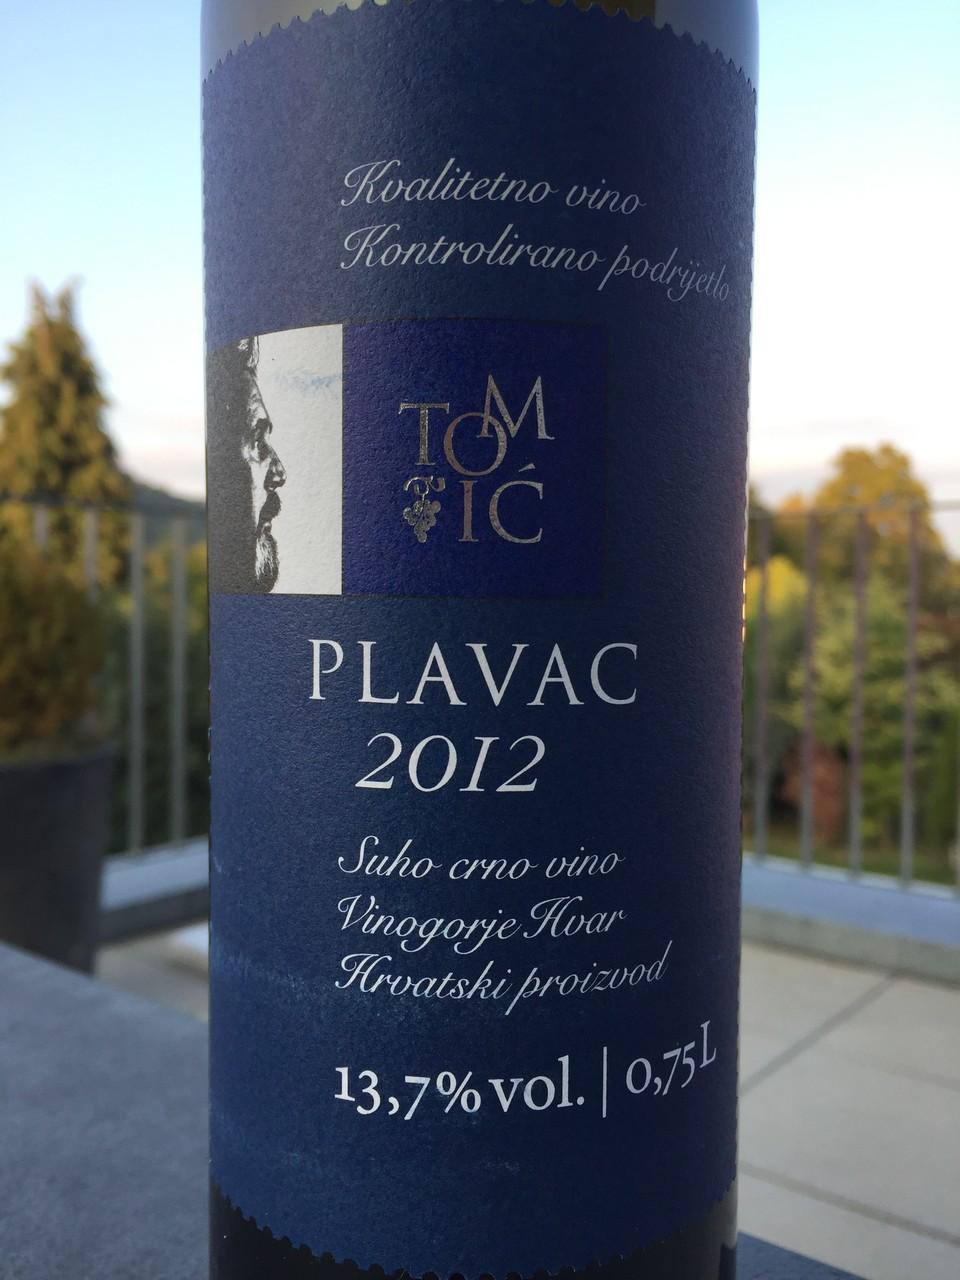 Plavac, Tomic, 2012